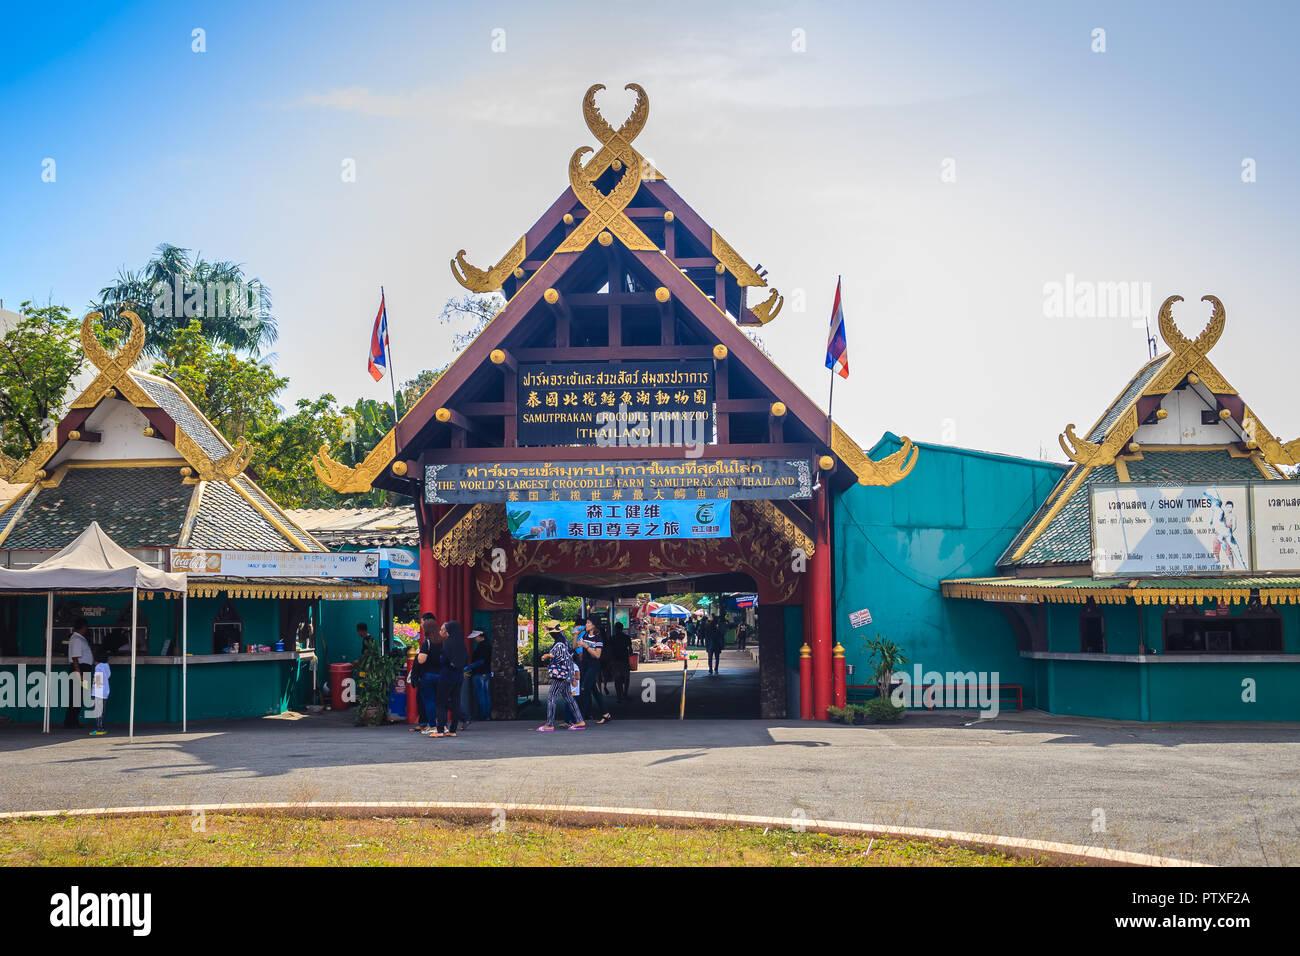 Samut Prakan, Thailand - March 25, 2017: Entrance gate of the Samut Prakan Crocodile Farm, the world's largest crocodile farm with over 60,000 crocodi - Stock Image